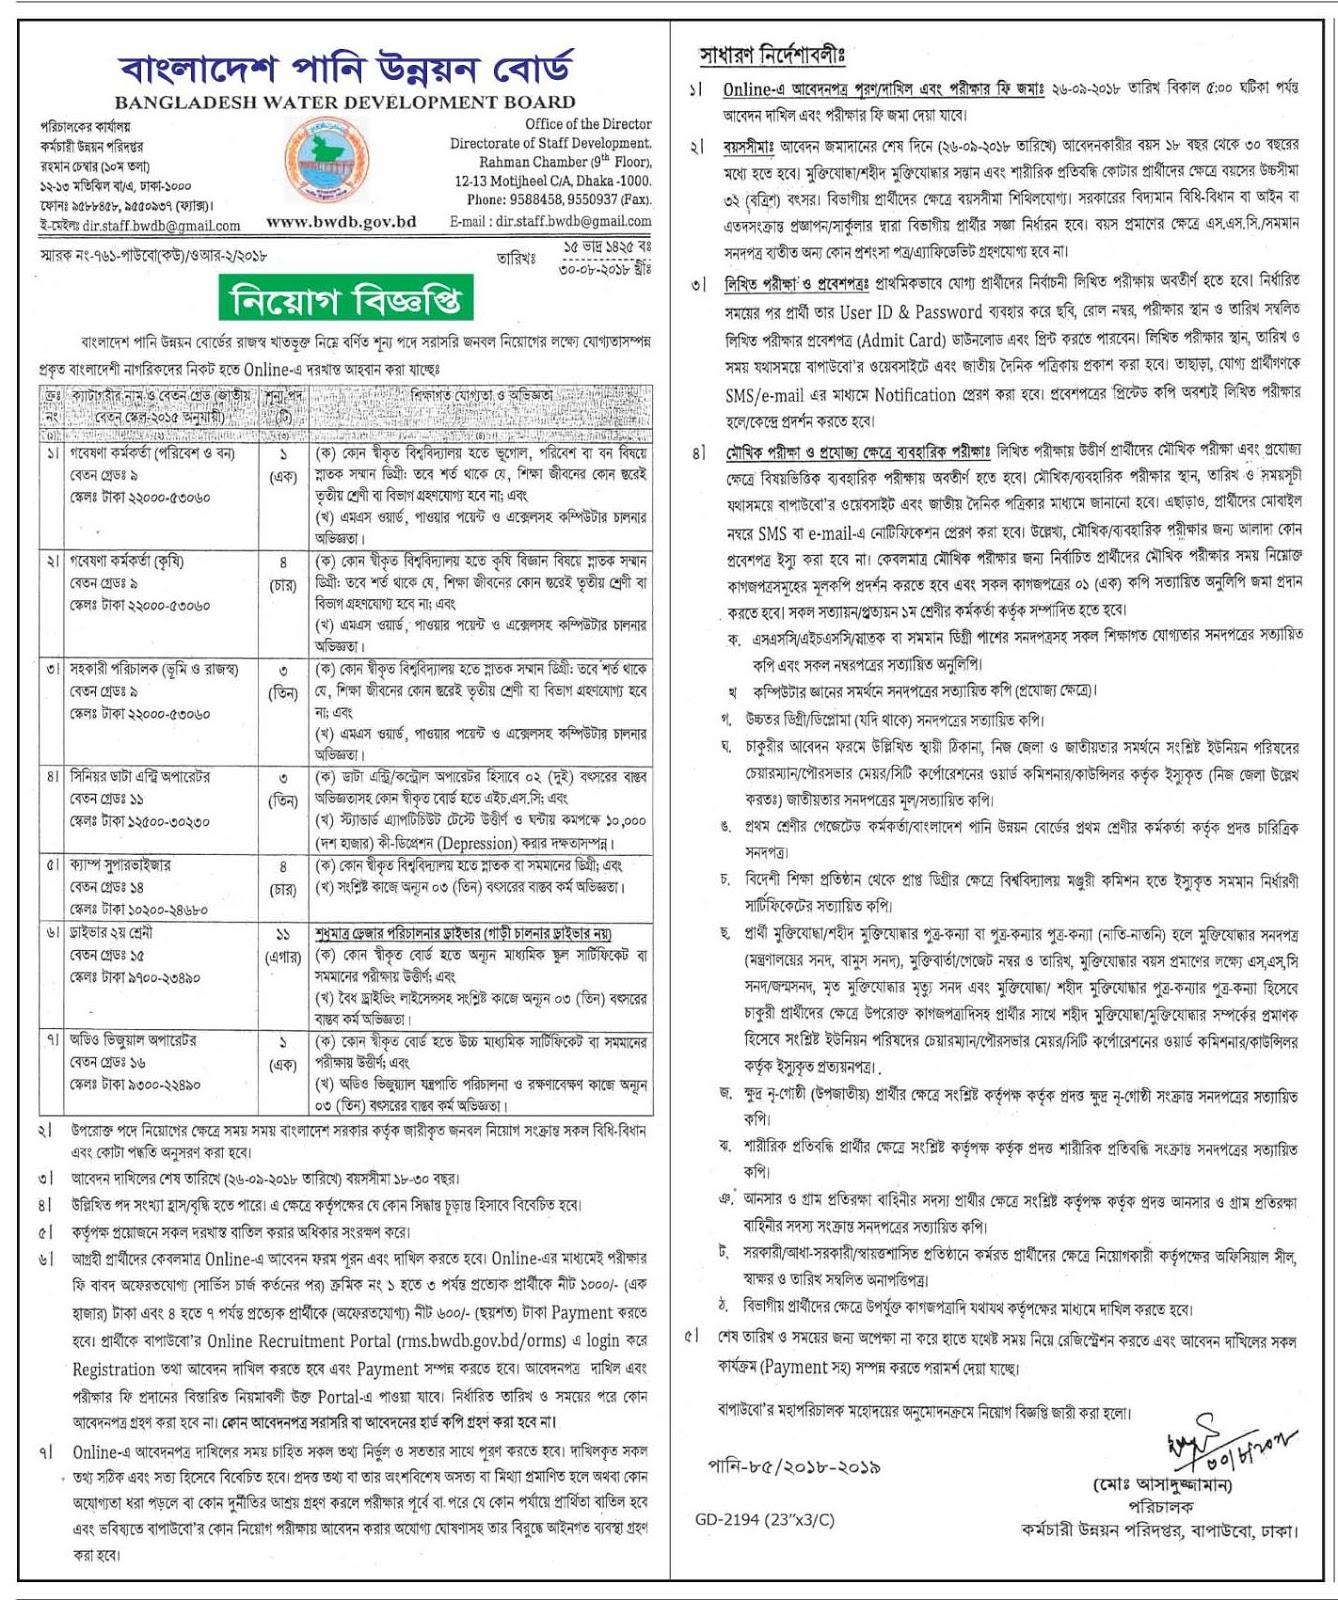 Bangladesh Water Development Board (BWDB) Job Circular 2018